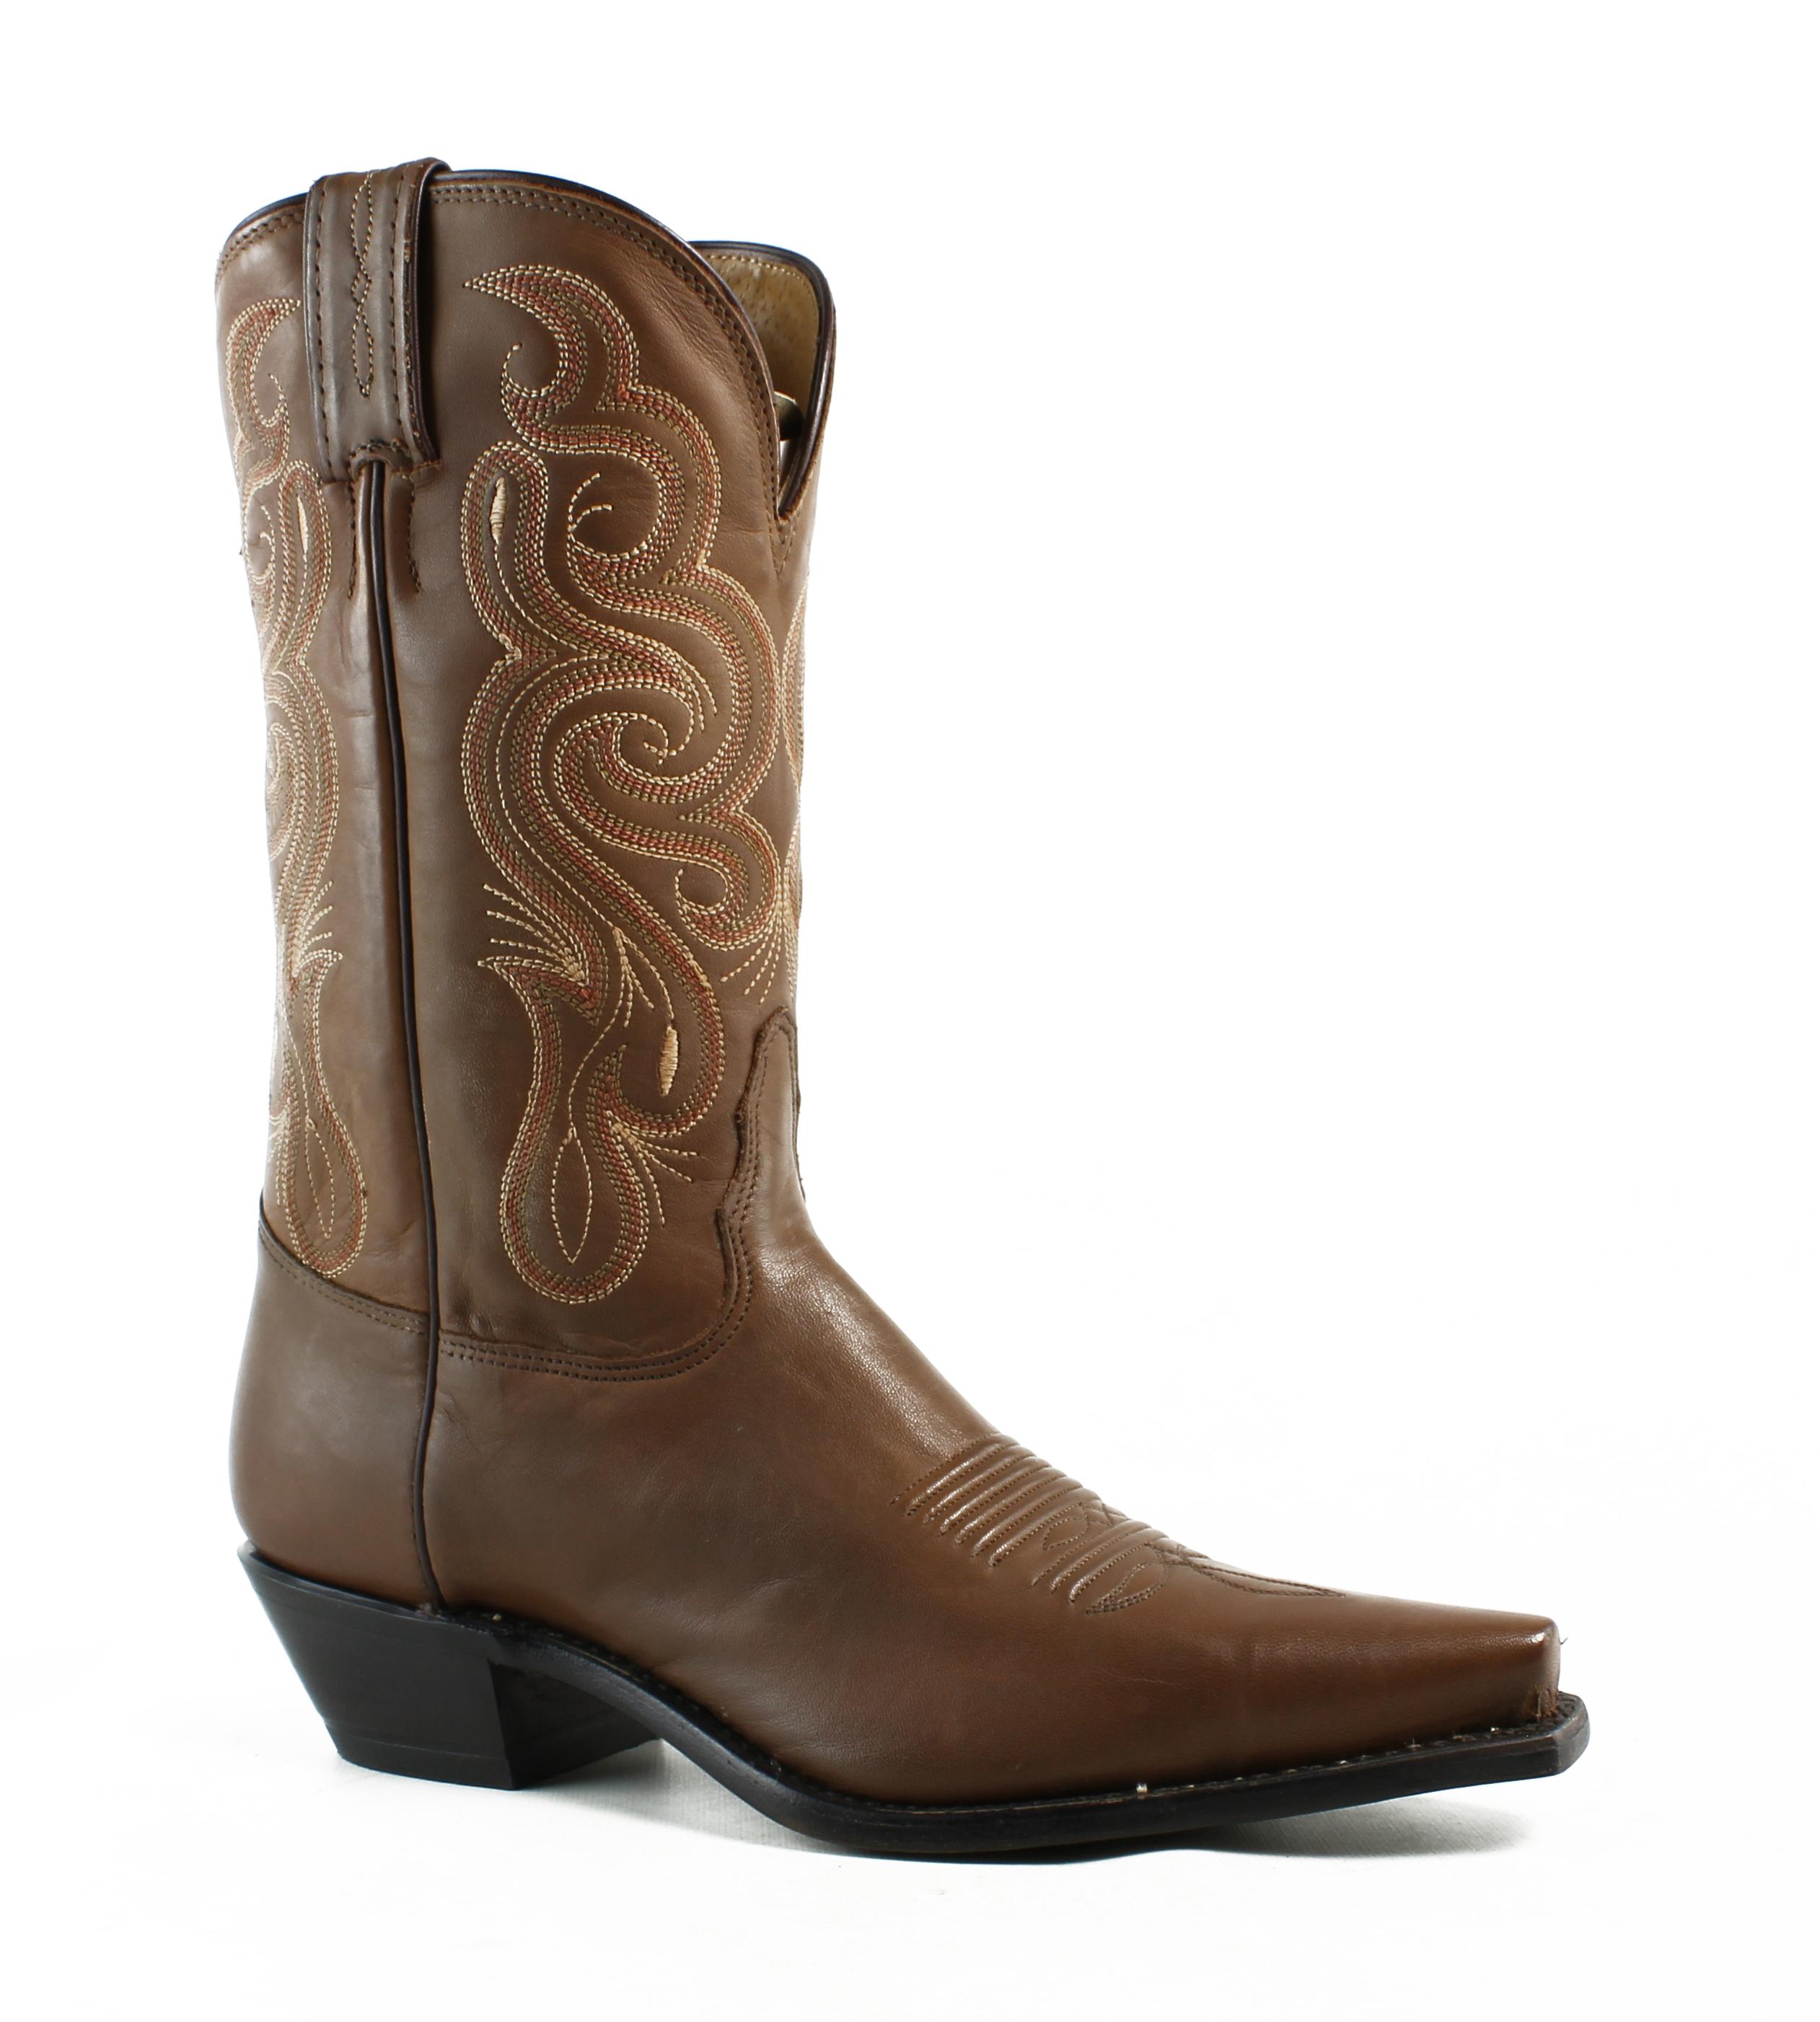 Tony Lama Stallion Pointed Toe Leather Western Boot by Tony Lama